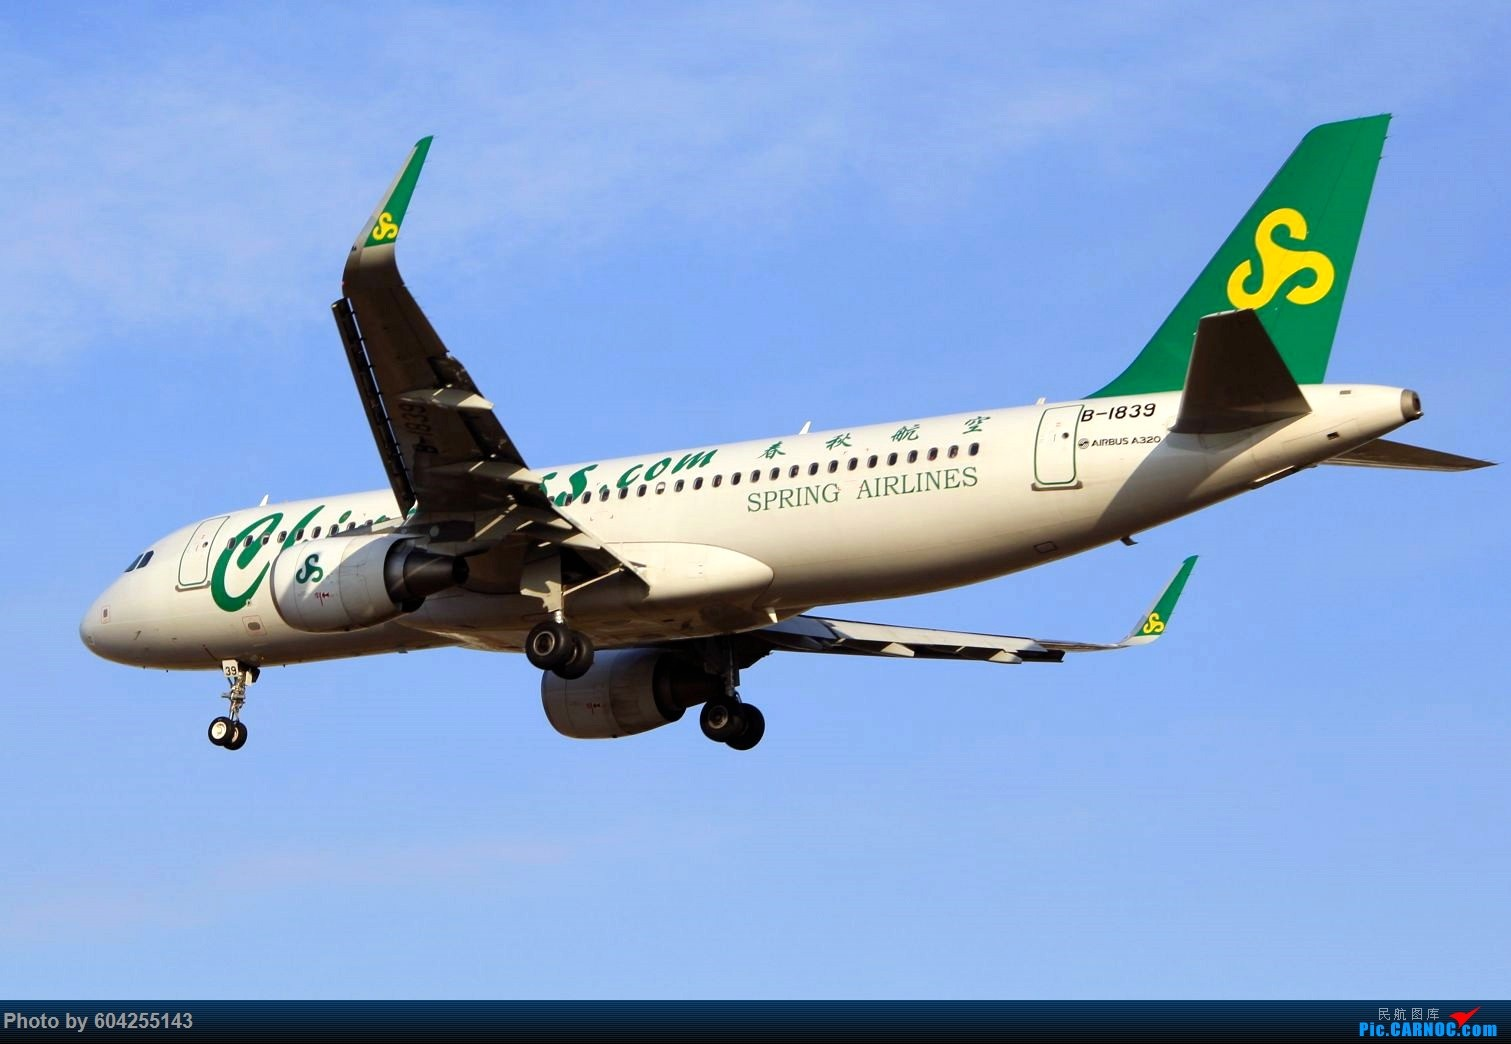 Re:[原创]渣图几张,没想到美图修完压缩的这么严重 AIRBUS A320-200 B-1839 中国大连周水子国际机场